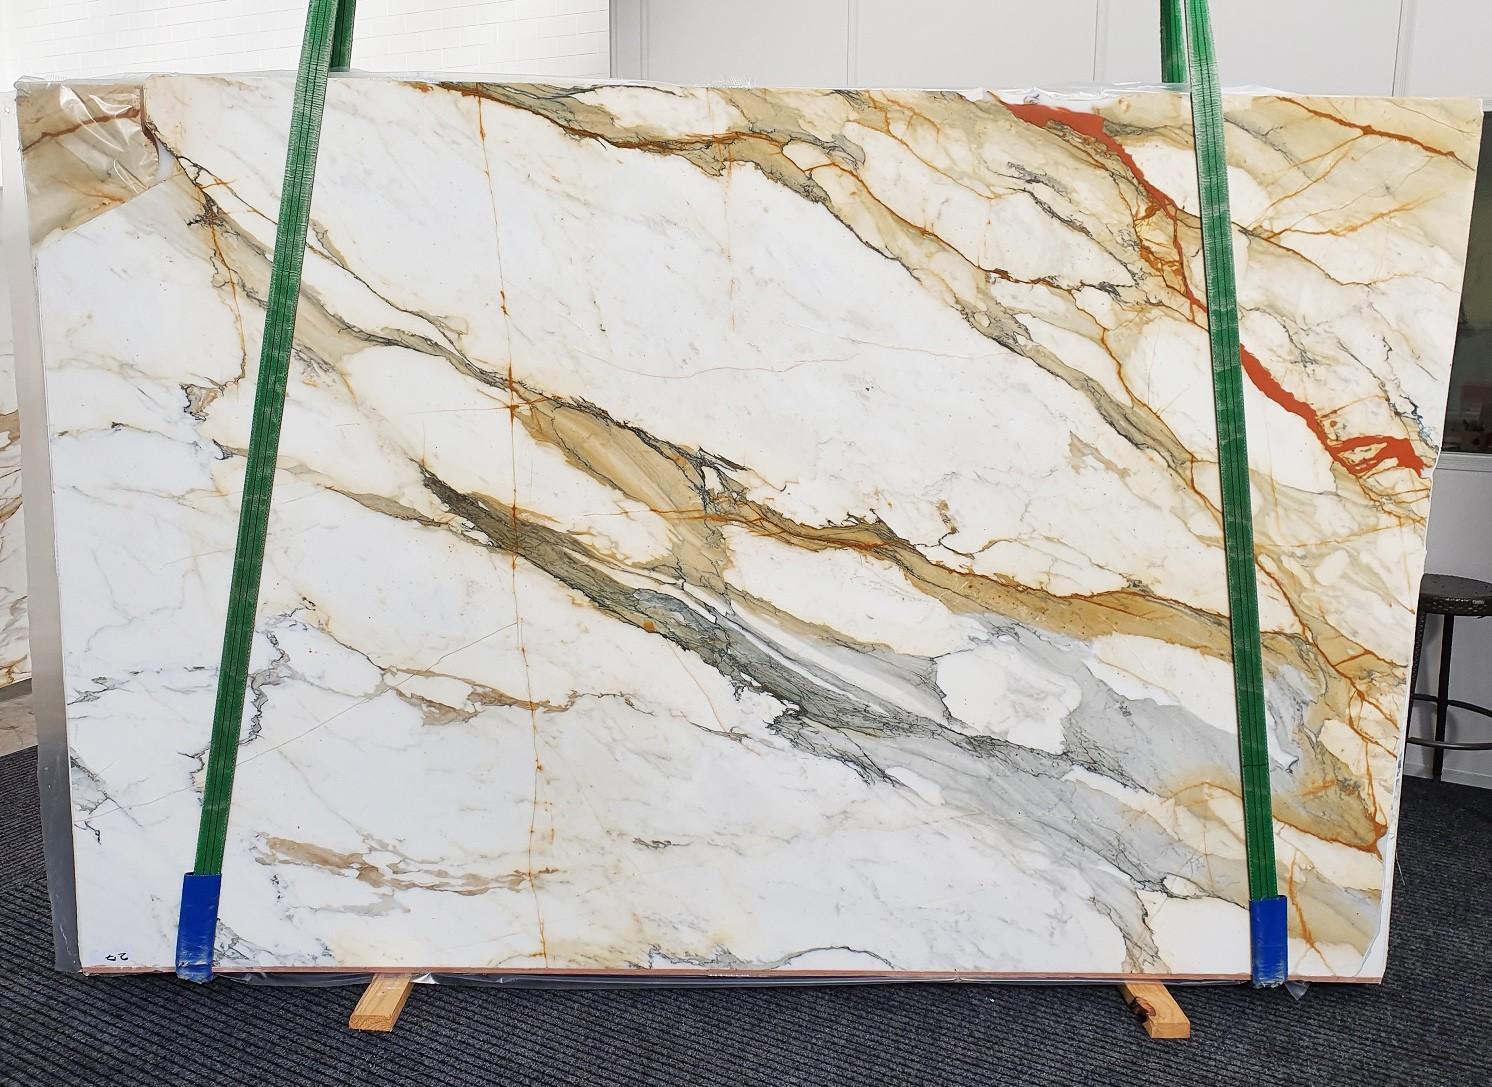 CALACATTA MACCHIAVECCHIA Fourniture Veneto (Italie) d' dalles brillantes en marbre naturel 1422 , Slab #27